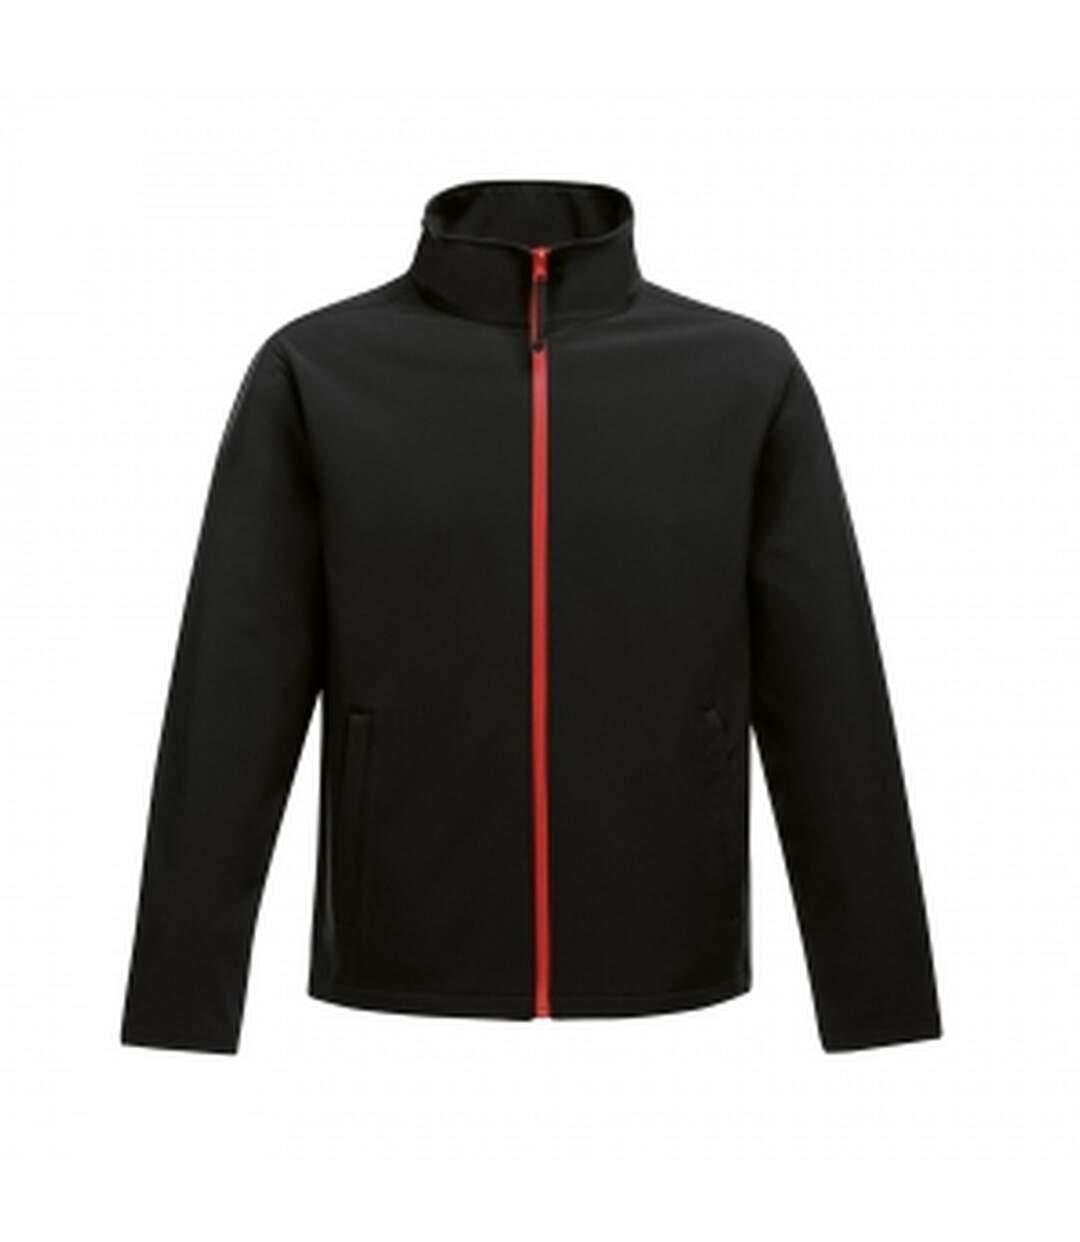 Regatta - Veste Softshell Ablaze - Homme (Noir/rouge) - UTRG3560